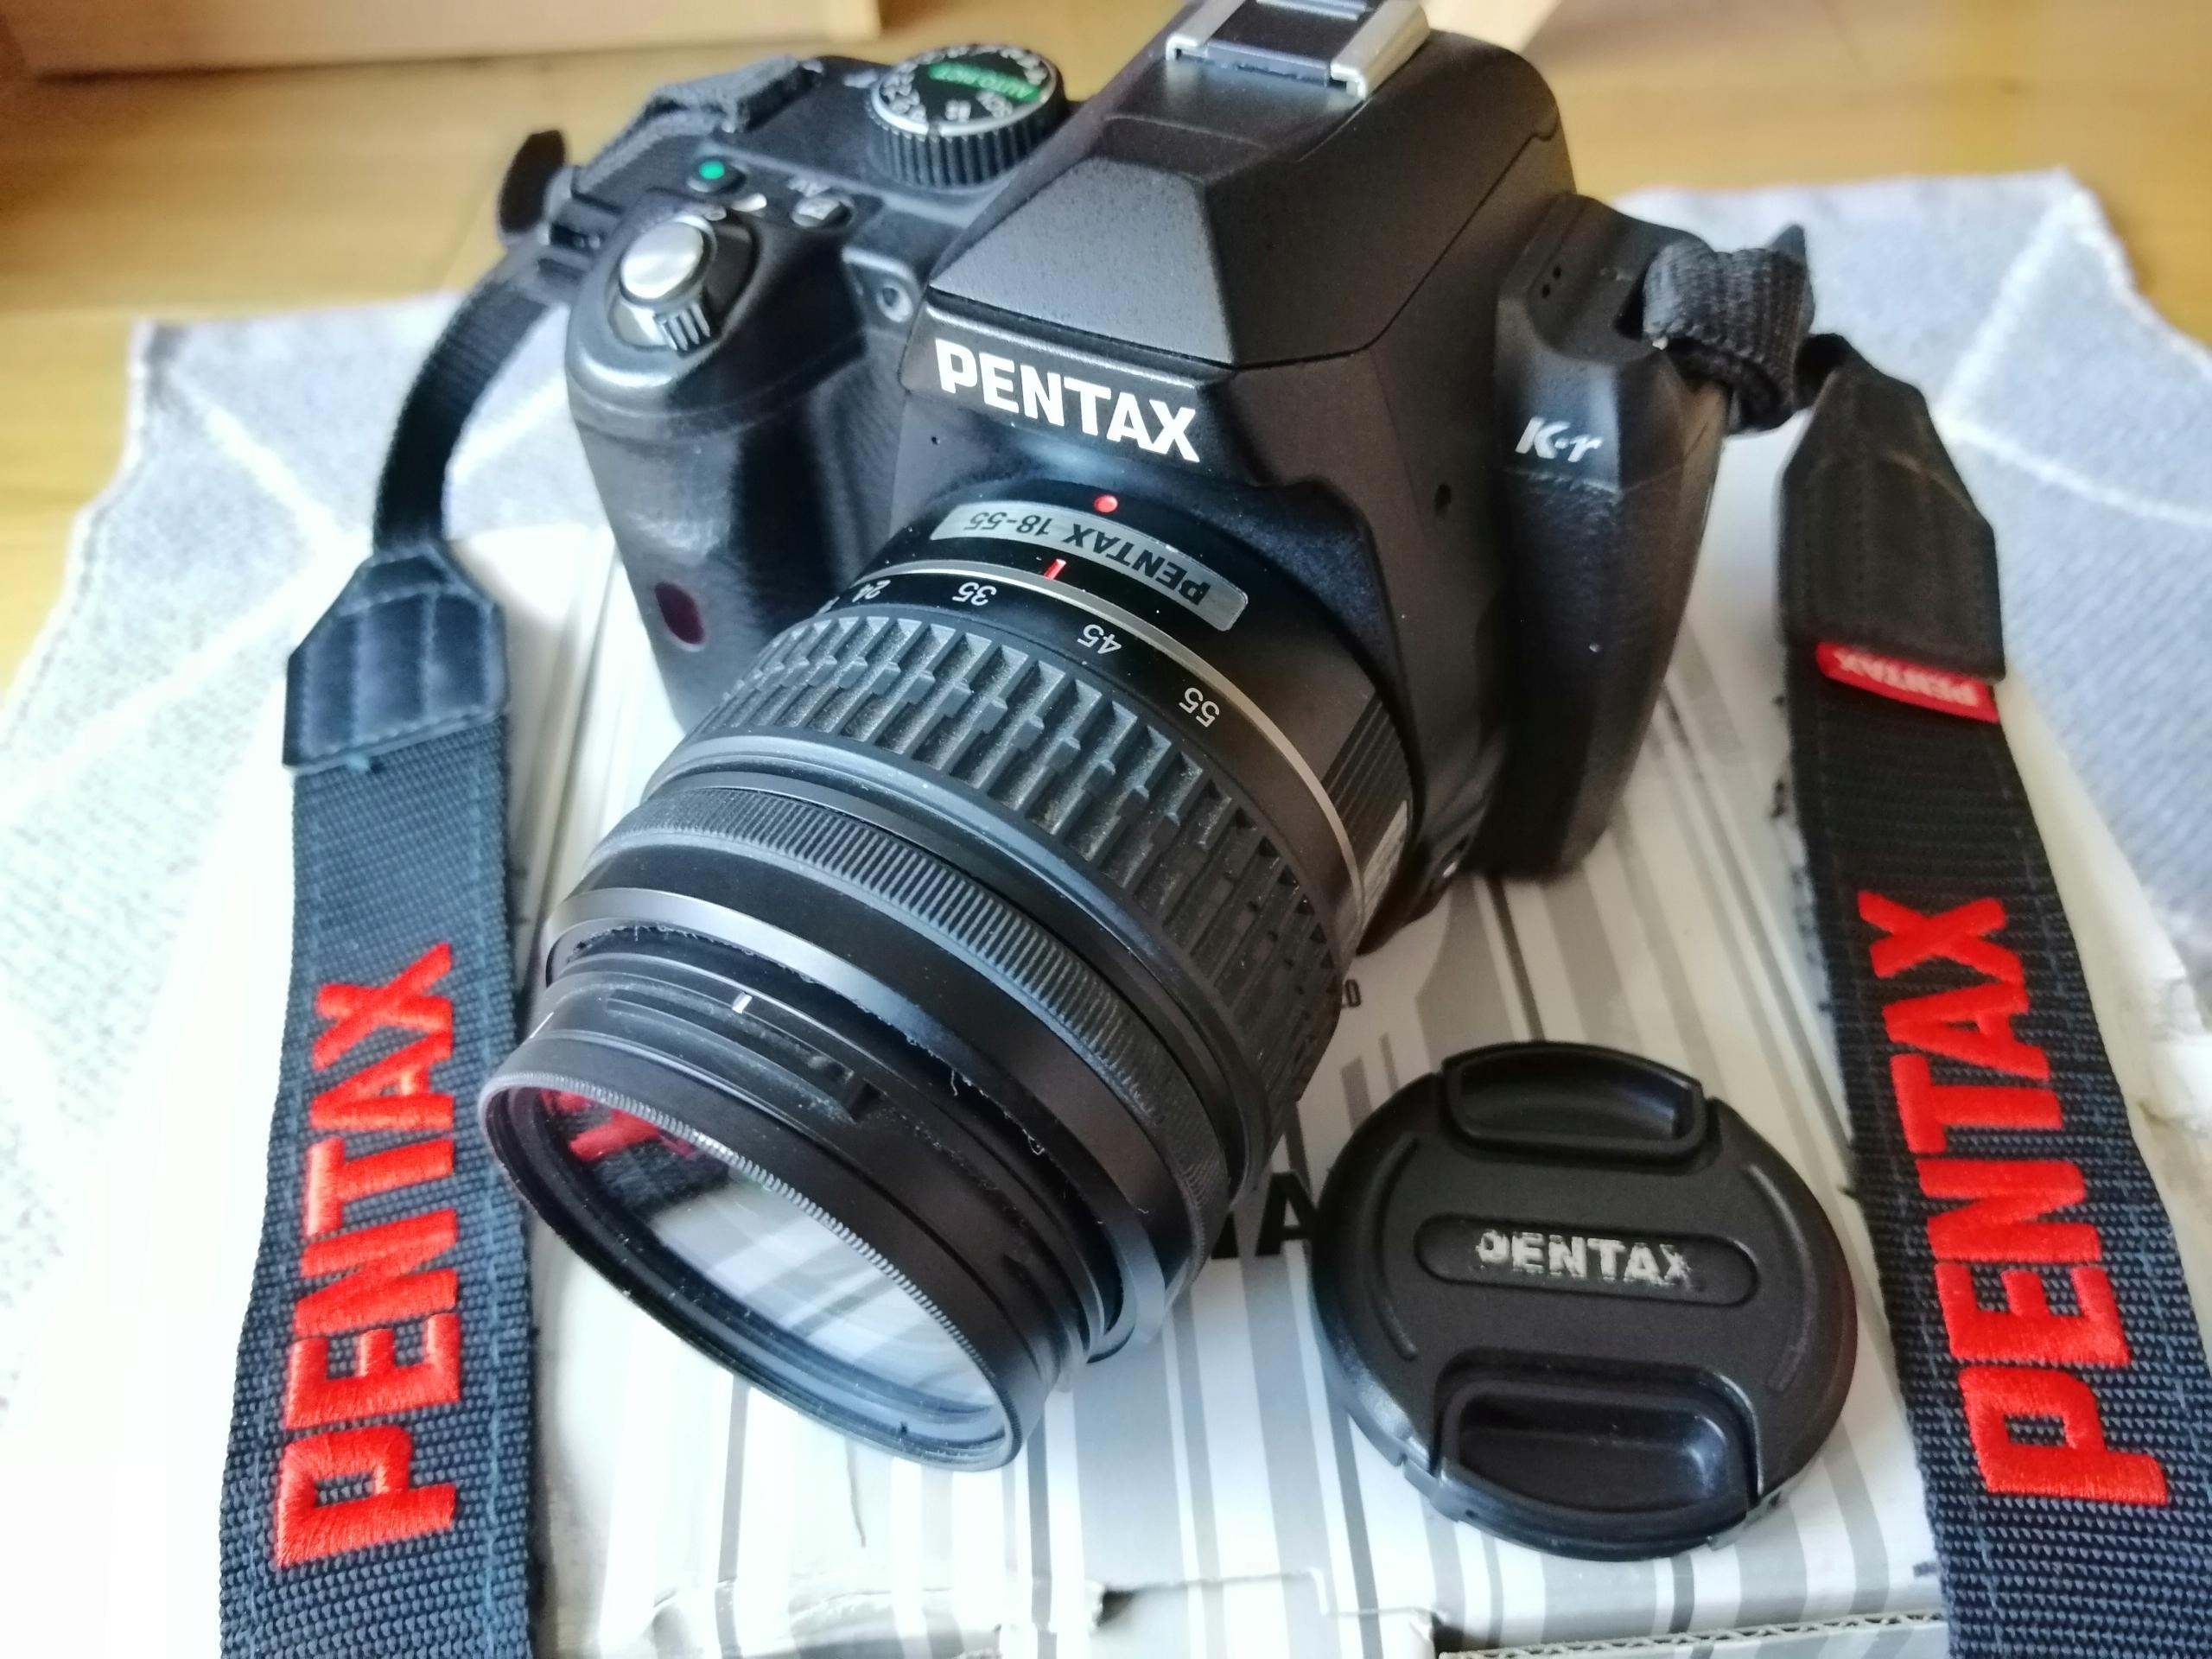 Aparat PENTAX K-R + akcesoria + kurier gratis